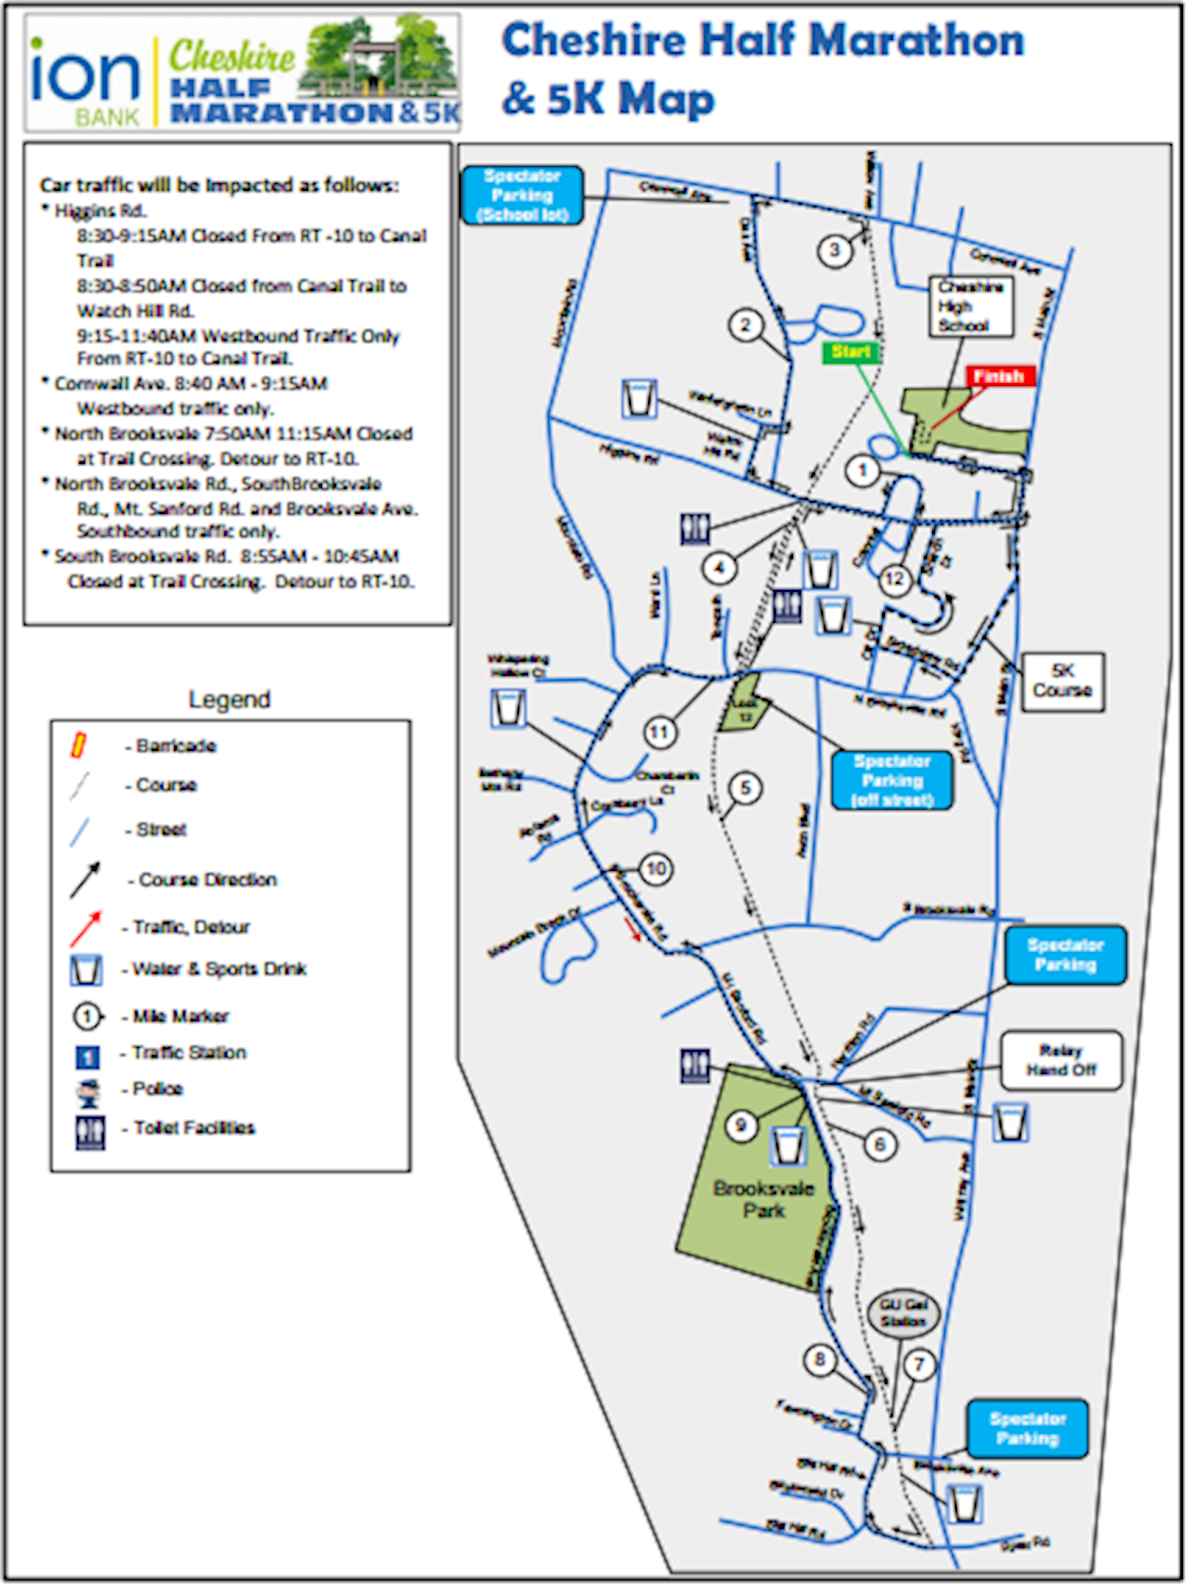 Ion Bank Cheshire Half Marathon & 5K 路线图